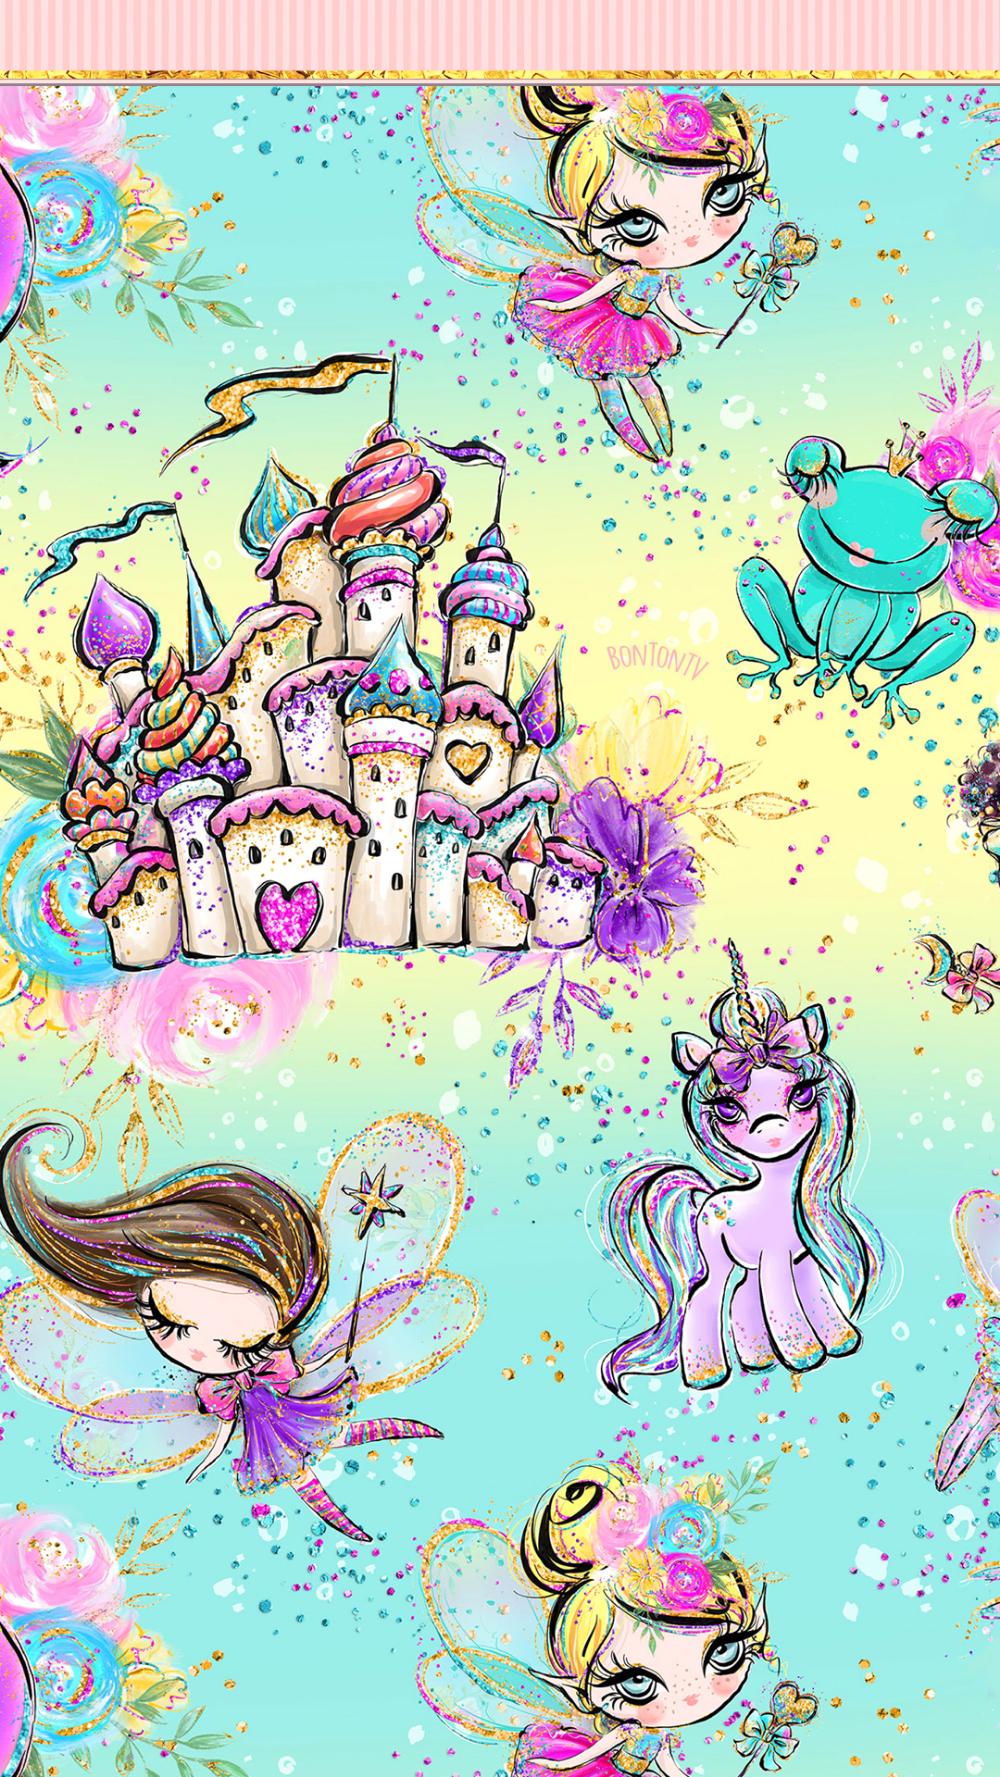 Telefono Fondos Hd Por Bonton Tv Free Download 1080x1920 Fondos Iphone Fondos De Android Unicorn Wallpaper Fairy Wallpaper Mermaid Wallpapers